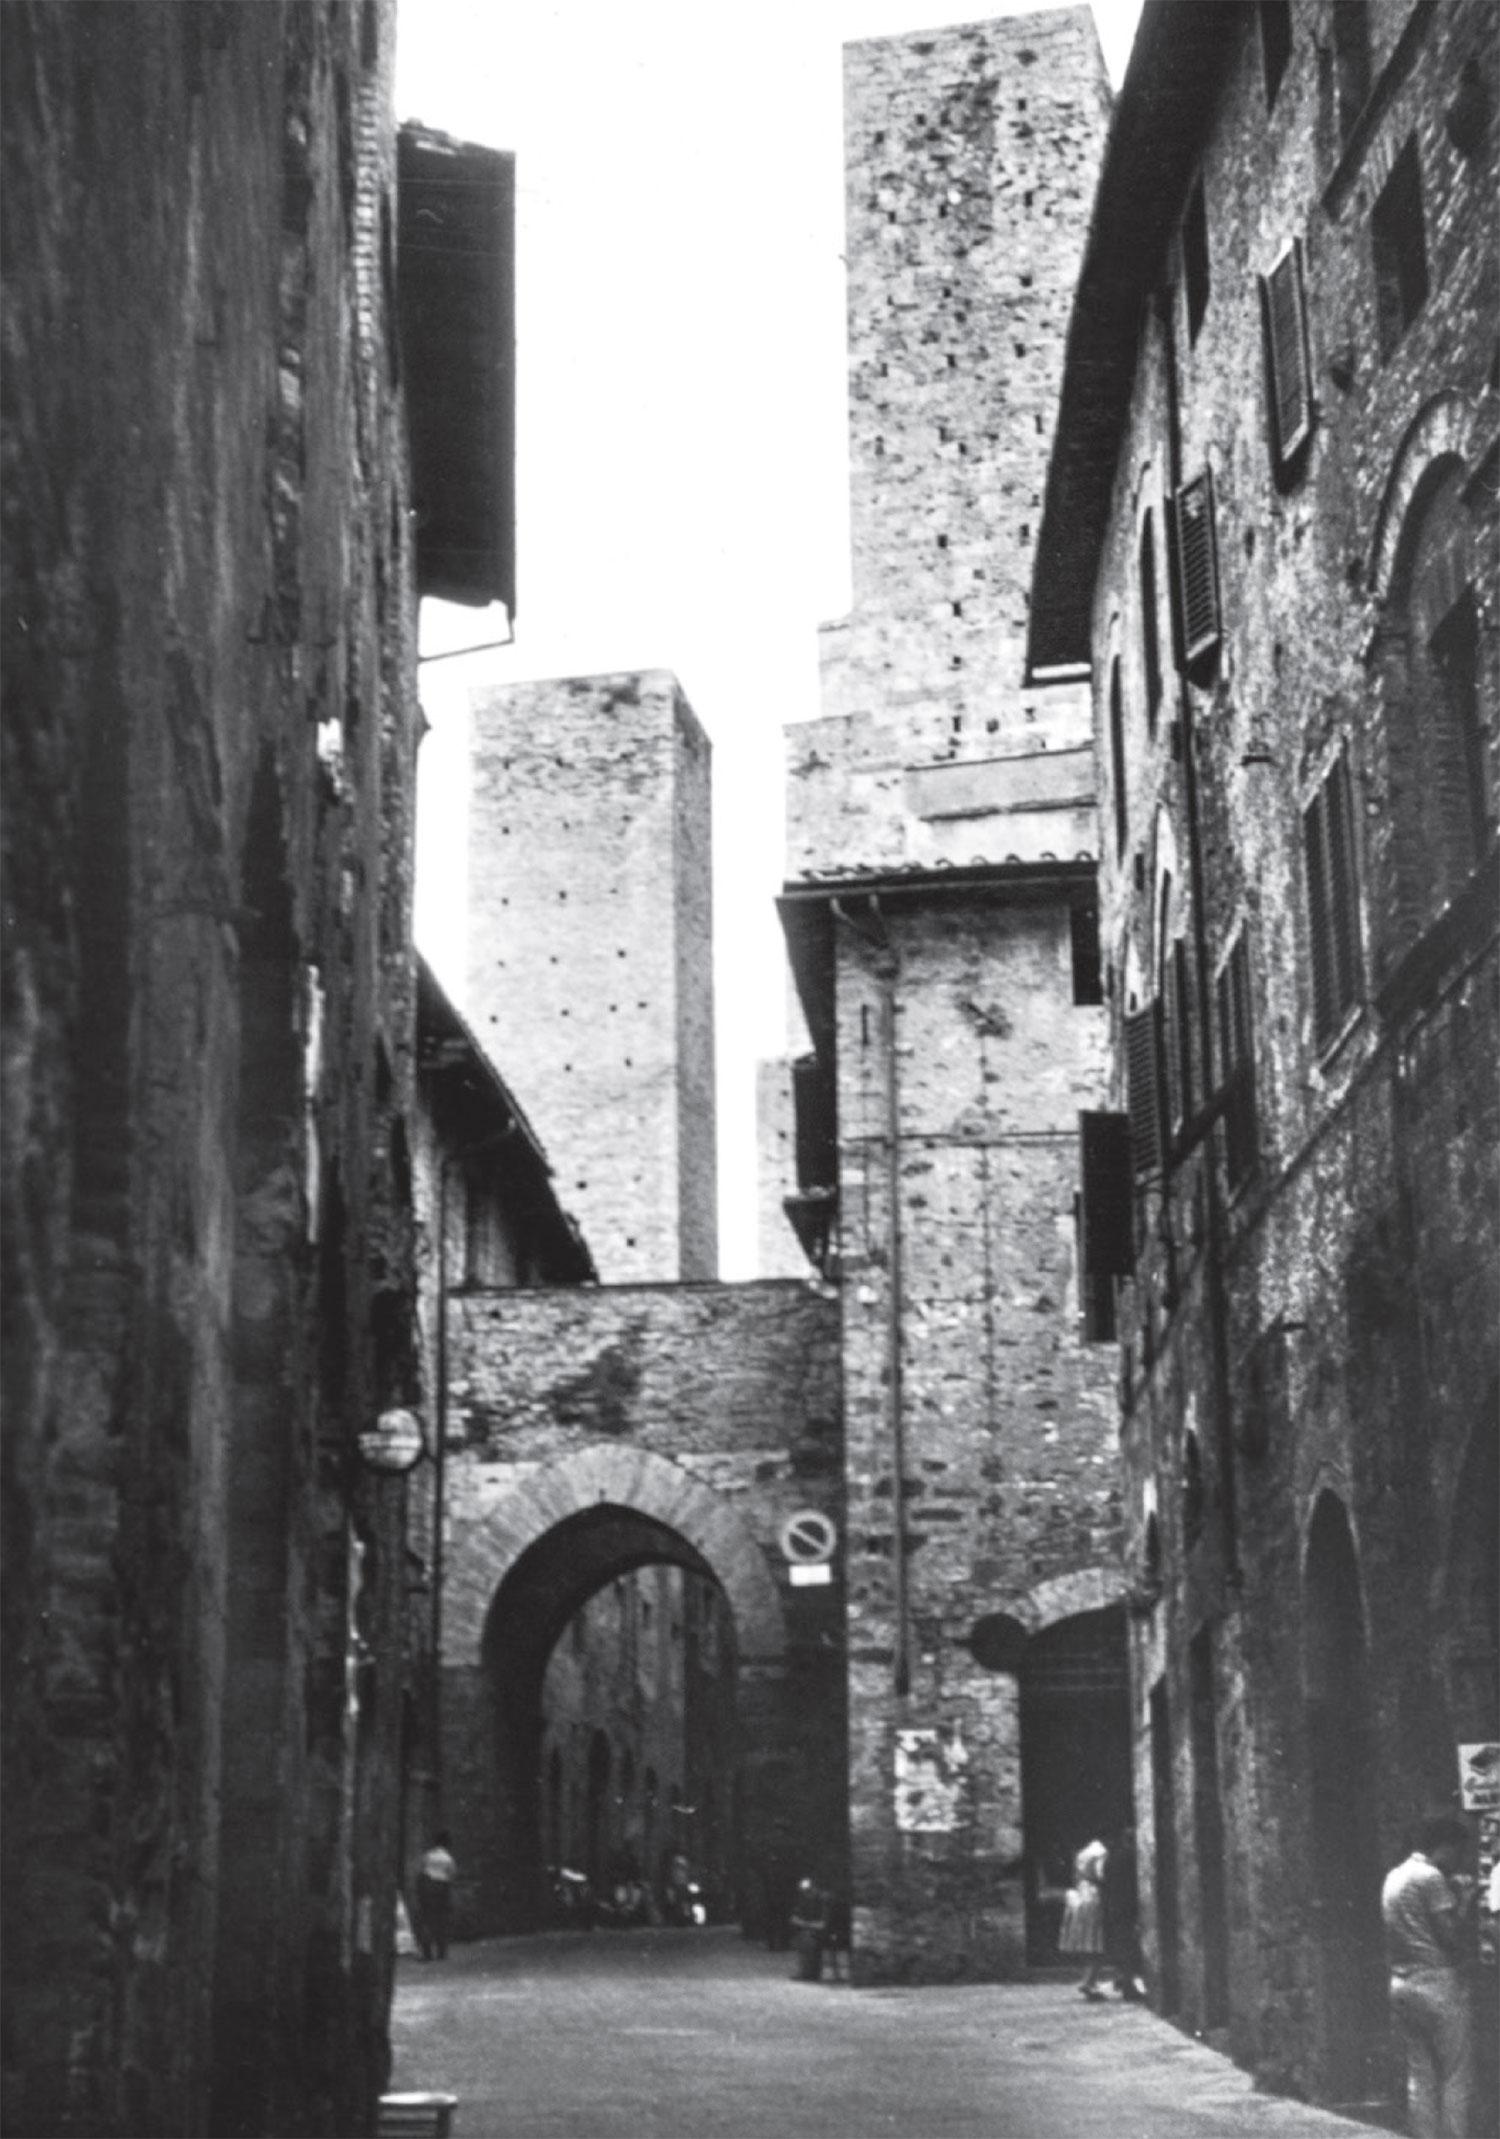 Piazza del Cisterna in San Gimignano, Italy